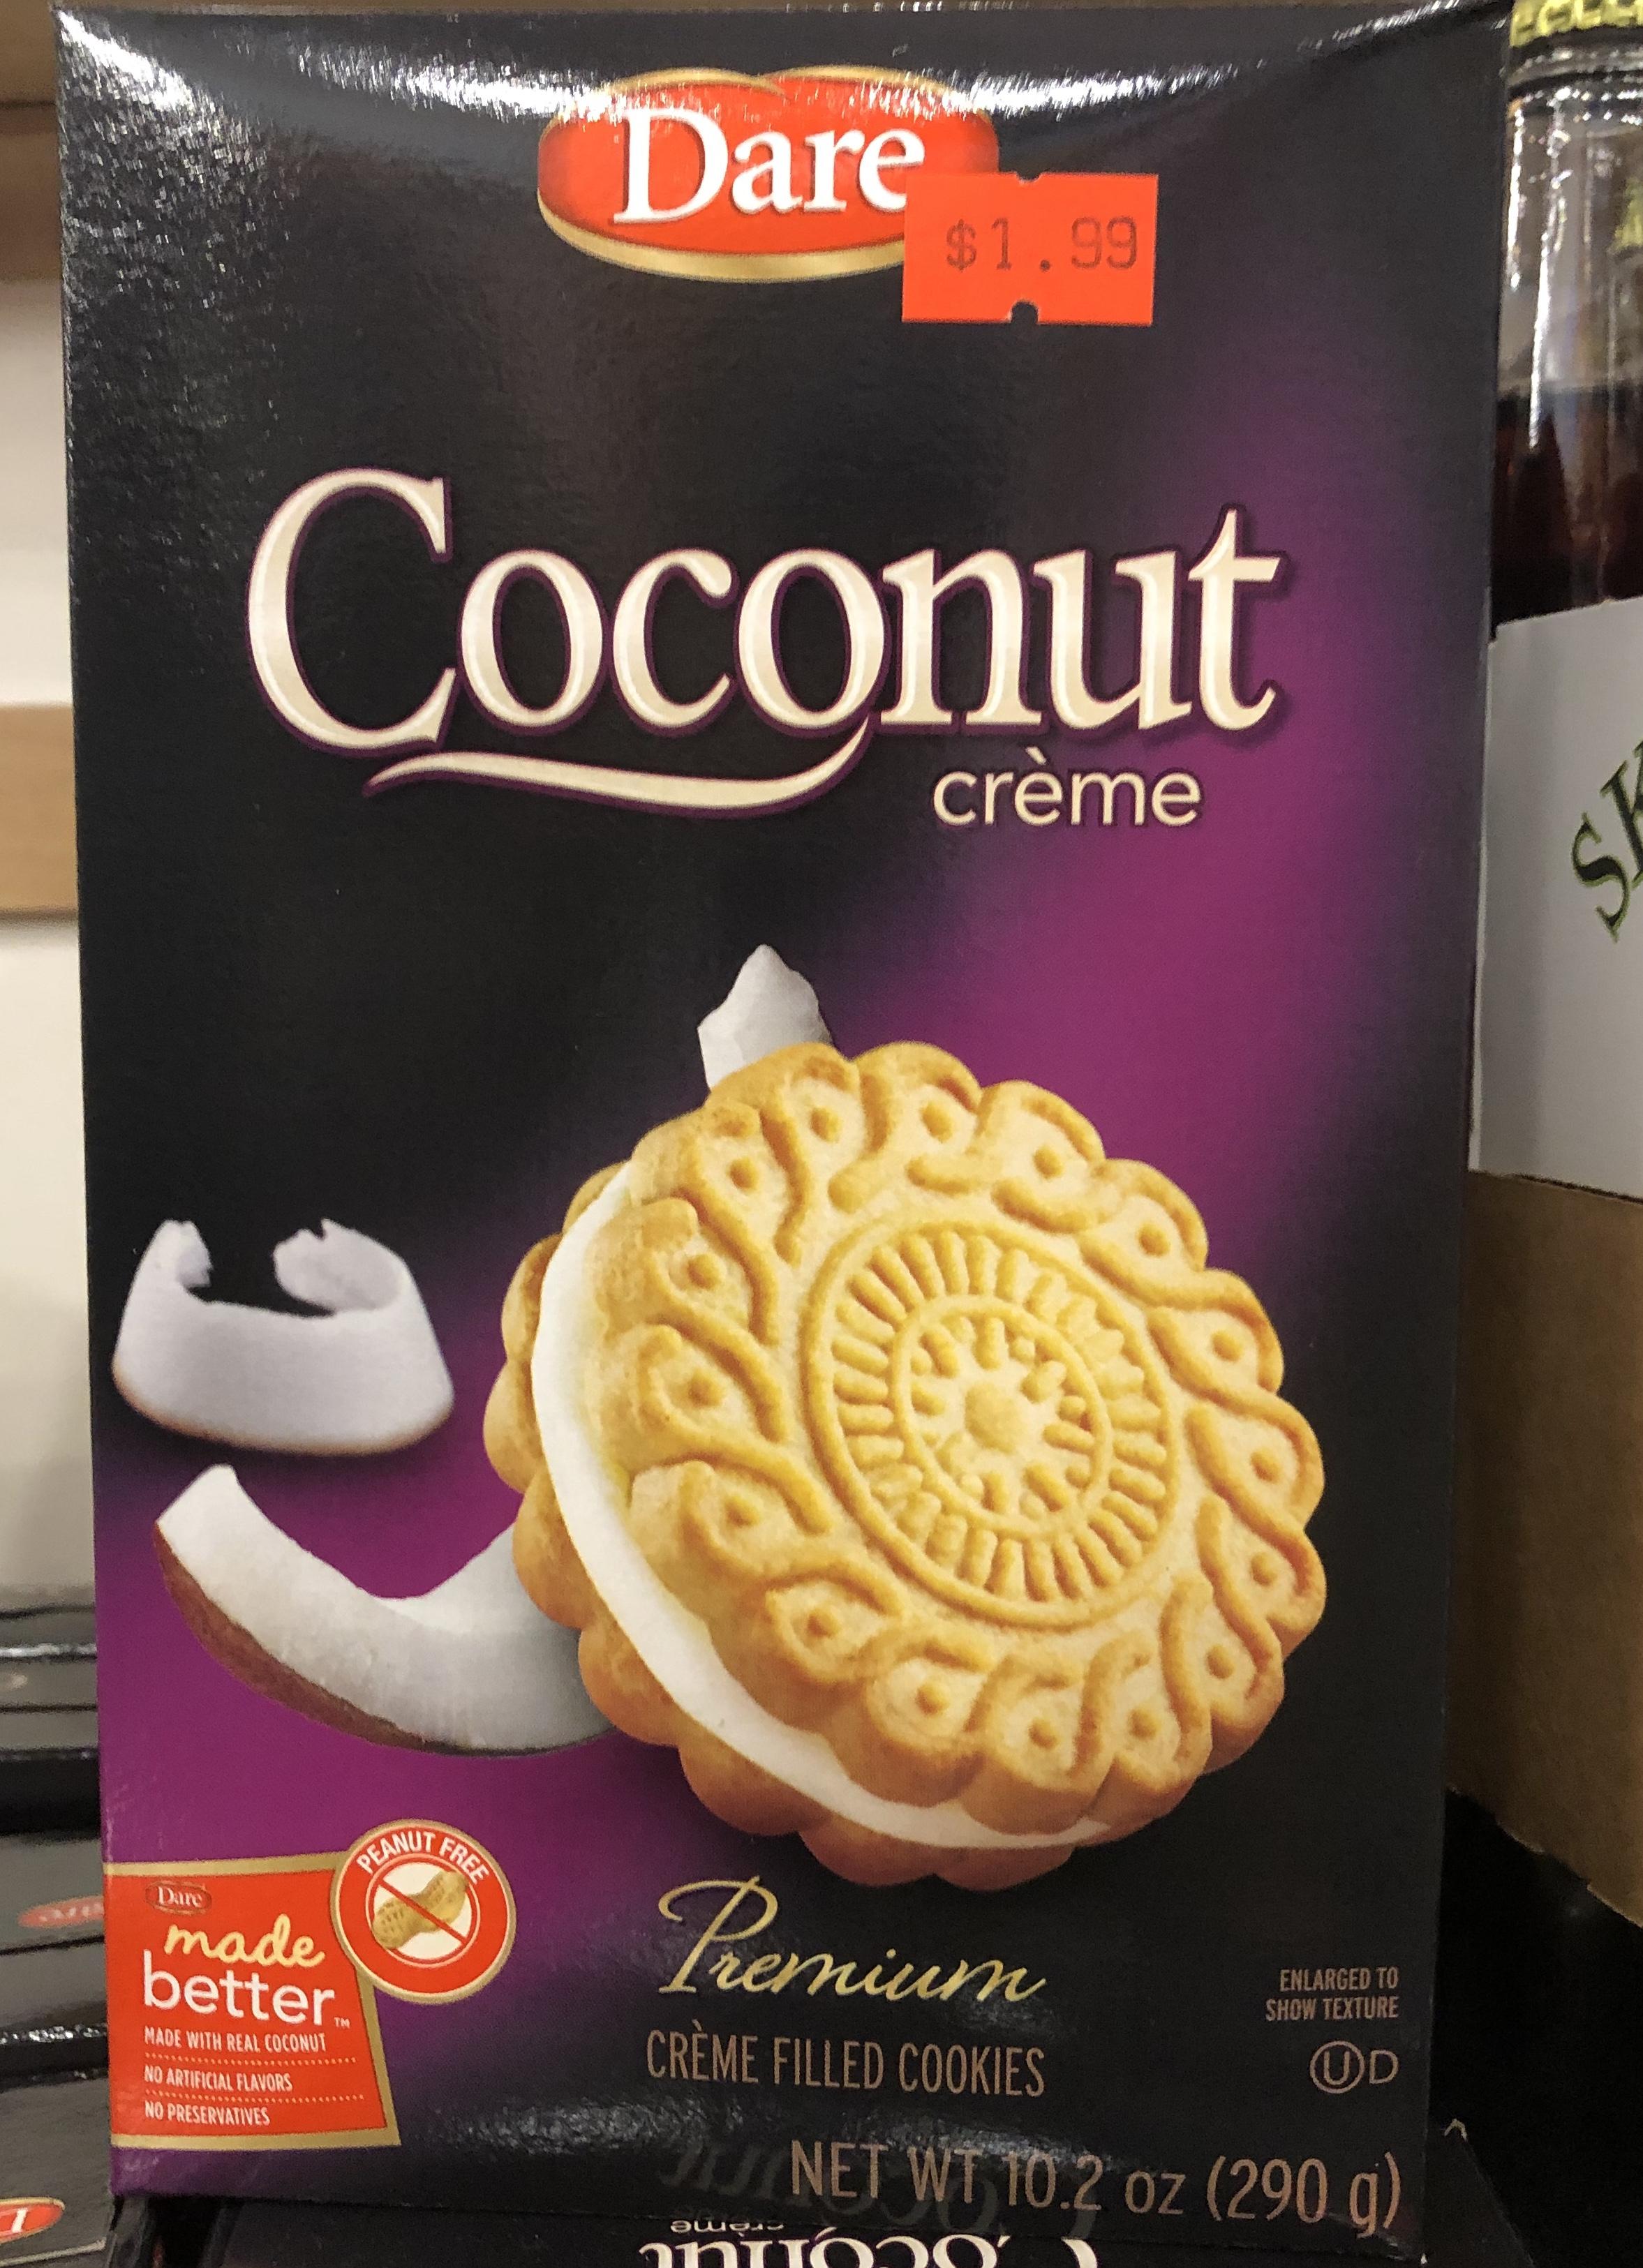 Dare Coconut Creme Cookies